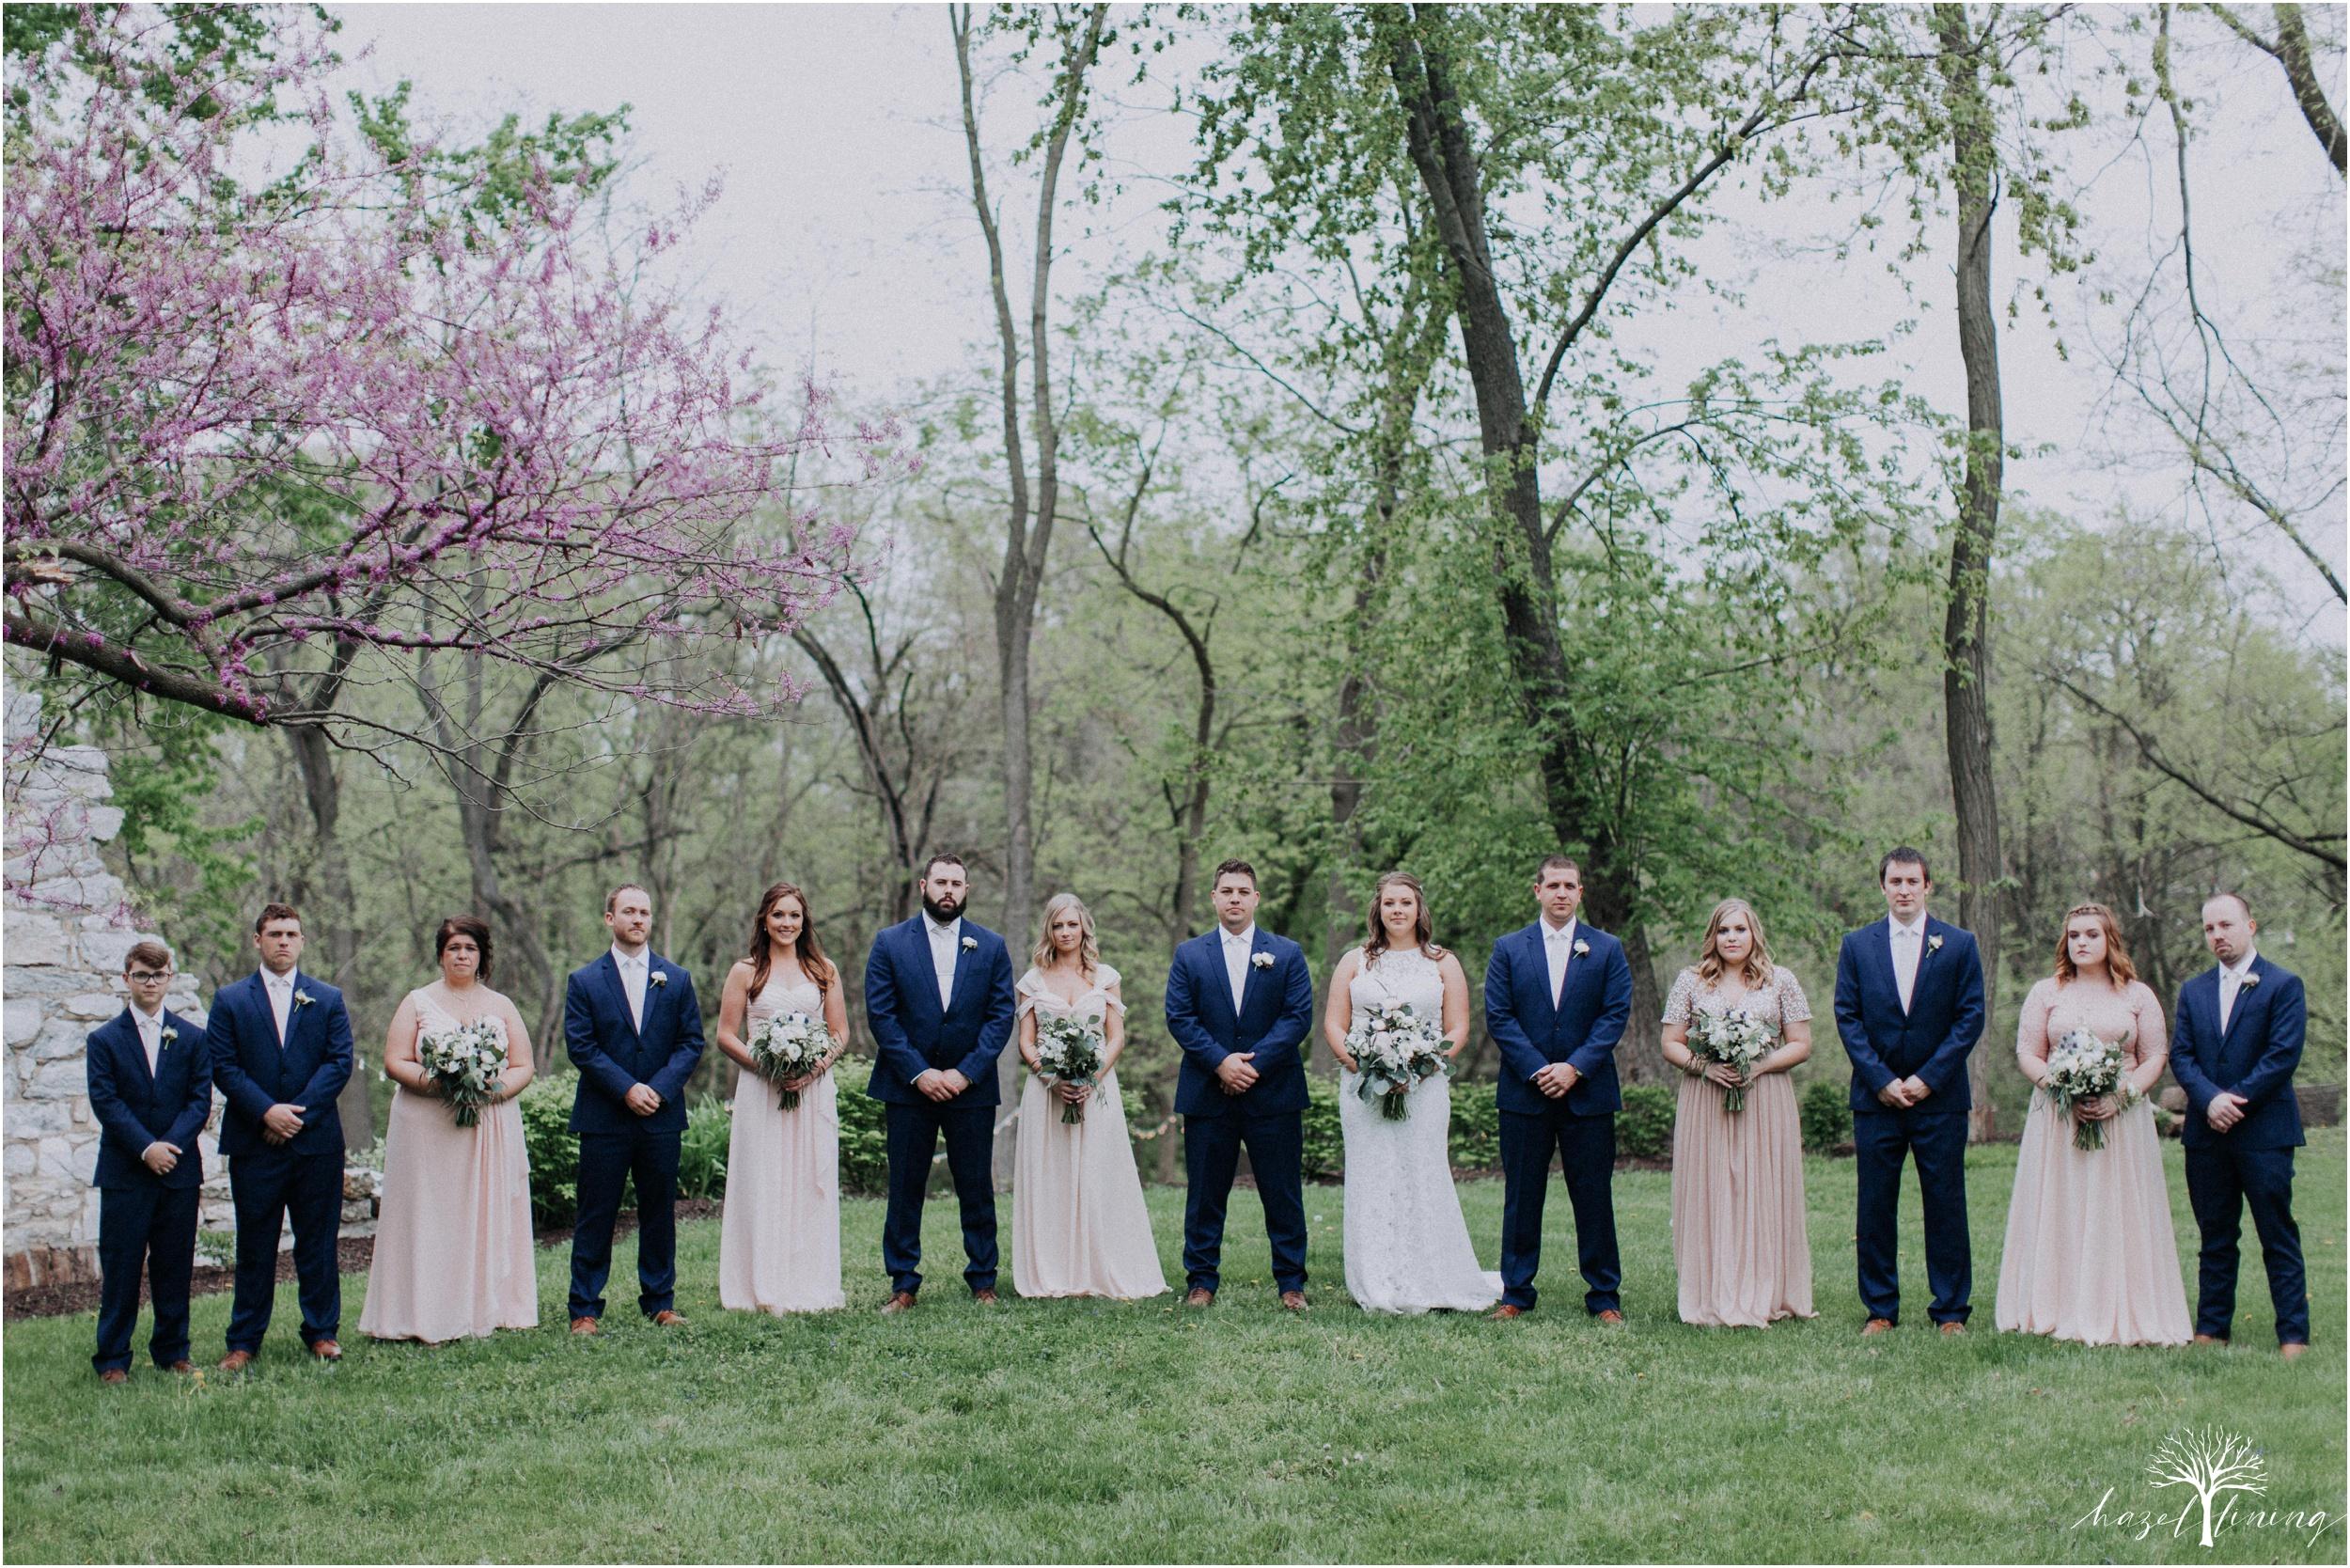 hazel-lining-travel-wedding-elopement-photography-abby-skyler-hunt-the-willis-house-york-pennsylvania-outdoor-estate-wedding_0061.jpg